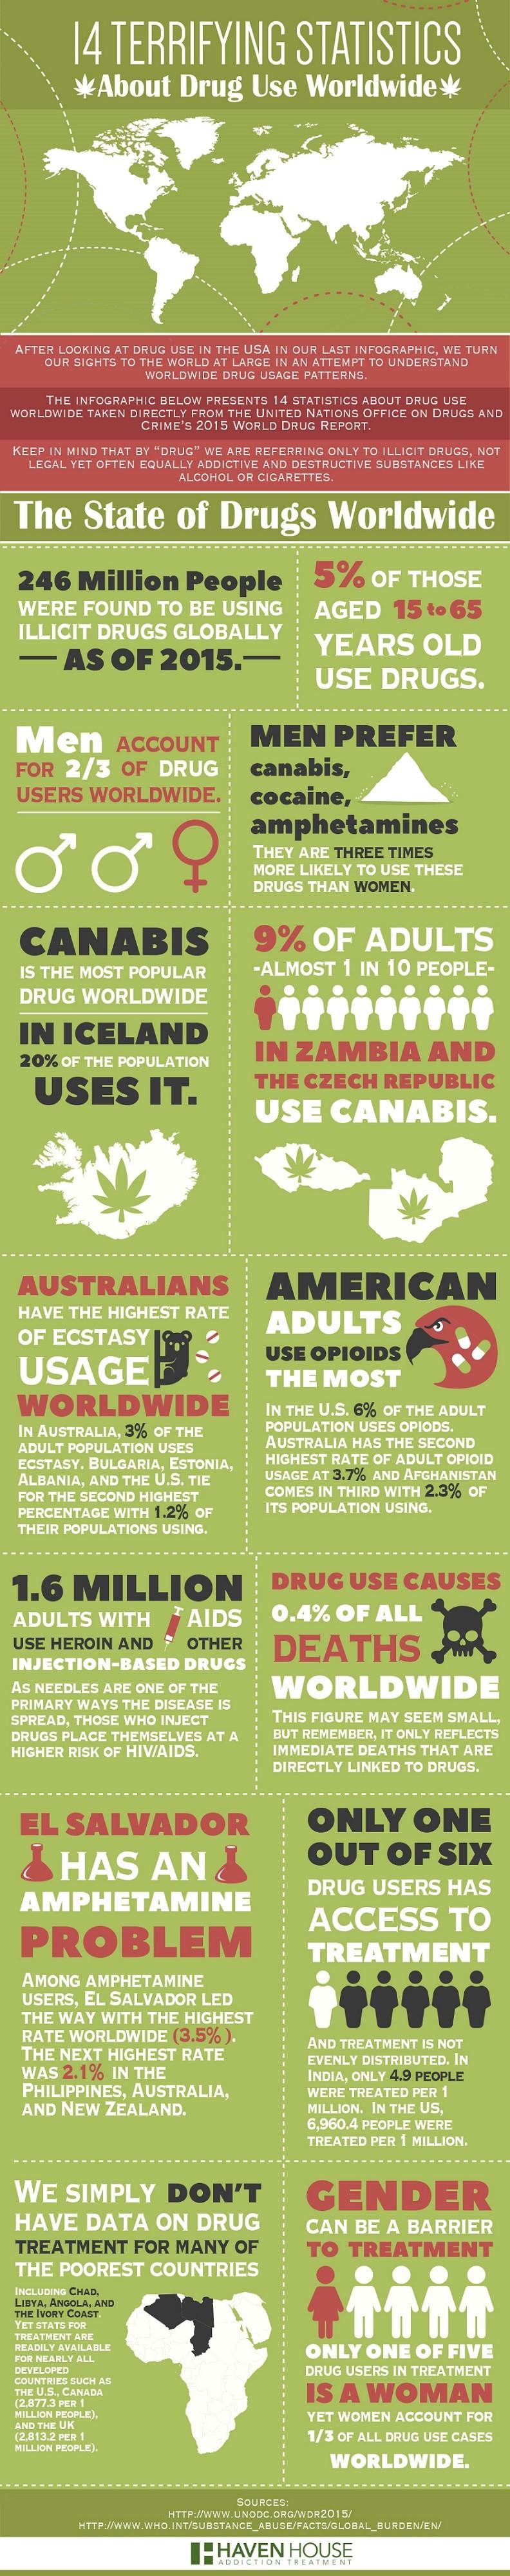 Addiction Wordlwide Drug Use Infographic